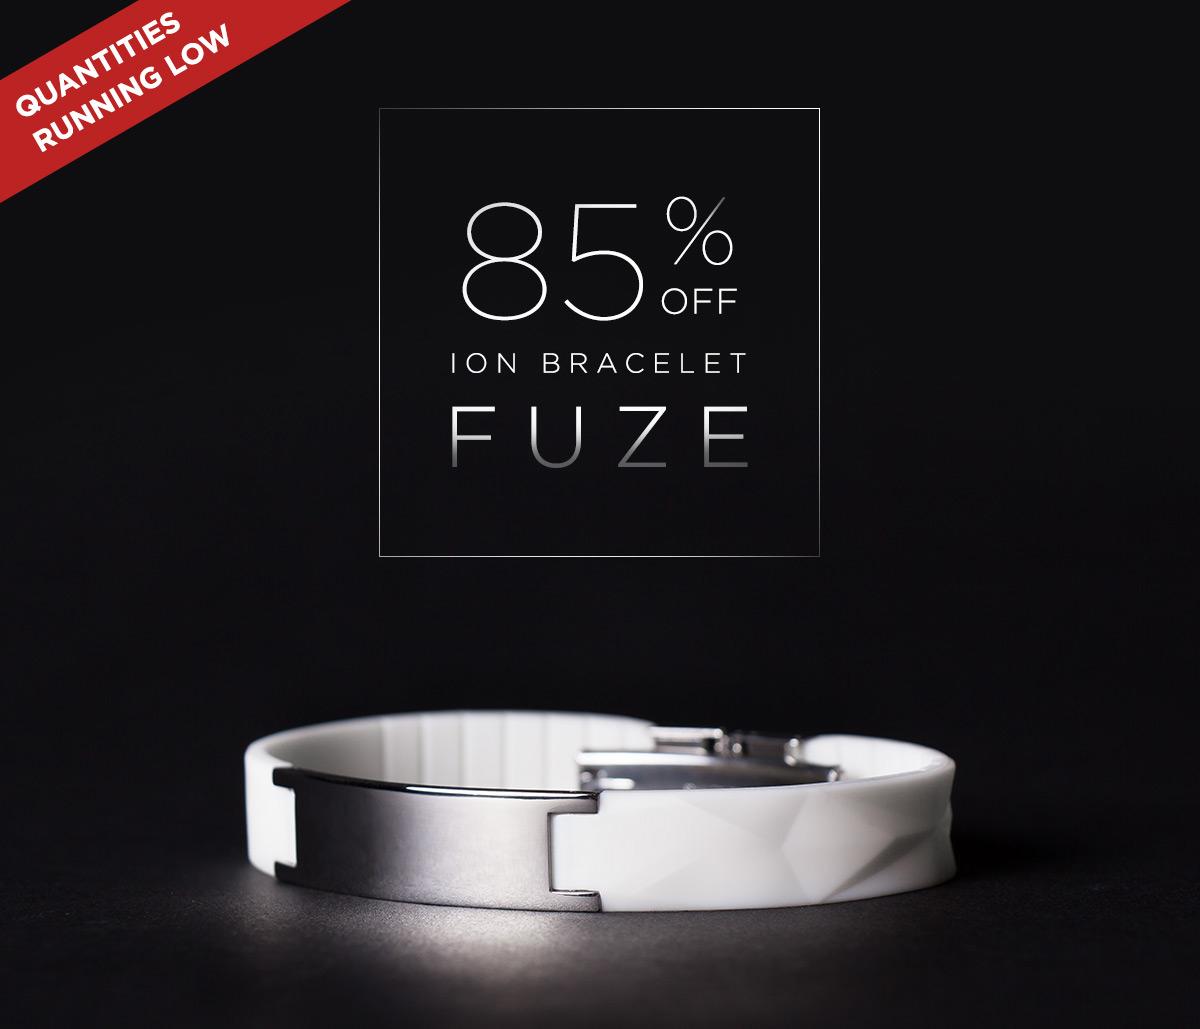 http://85% Off FUZE Ion Bracelet